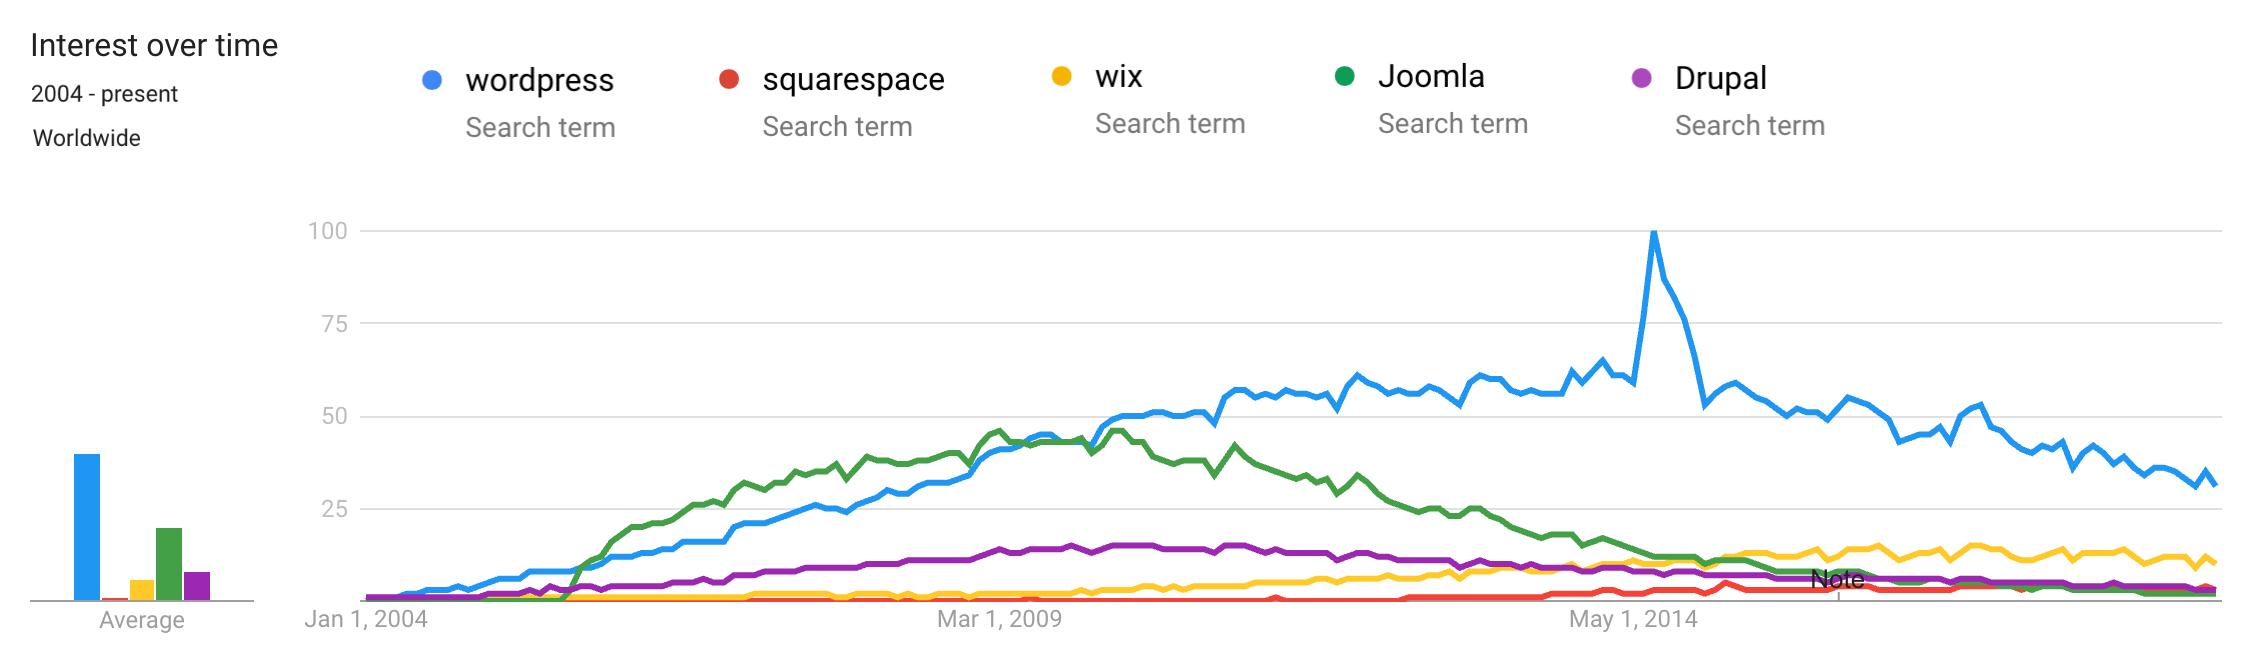 WordPressとその他のCMSの傾向